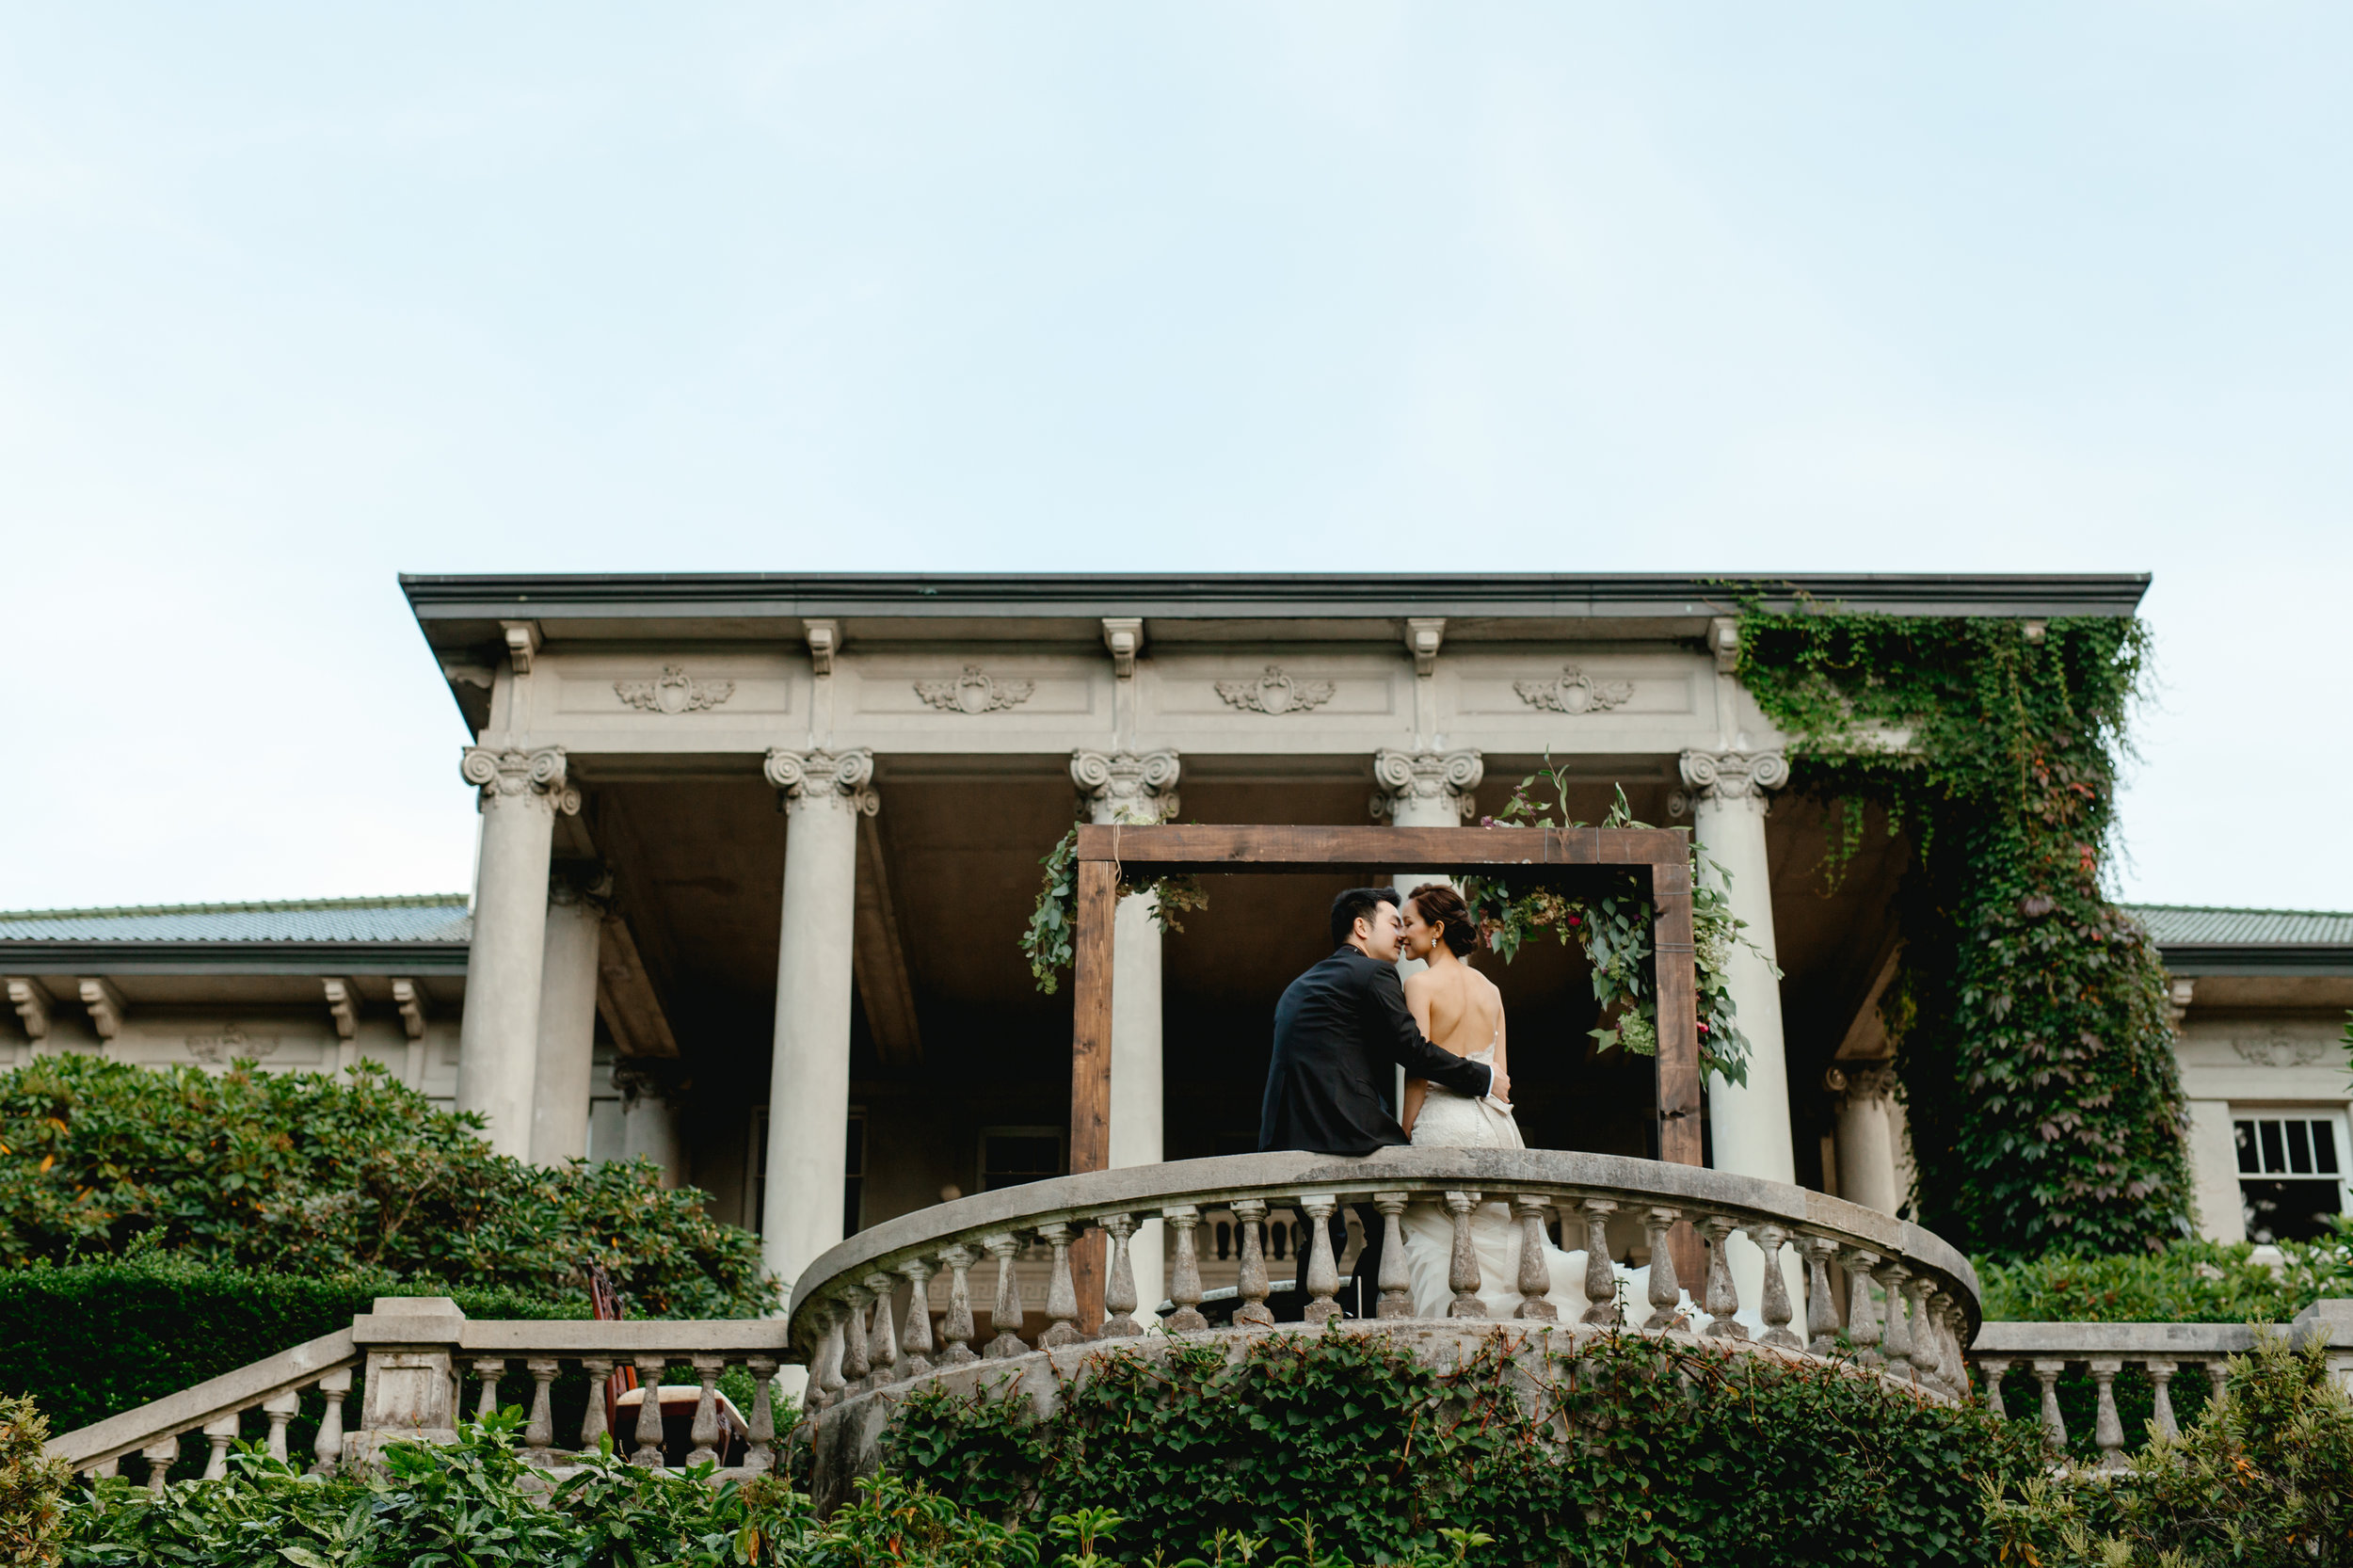 herafilms_wedding_sara_lei_hera_selects-44.jpg